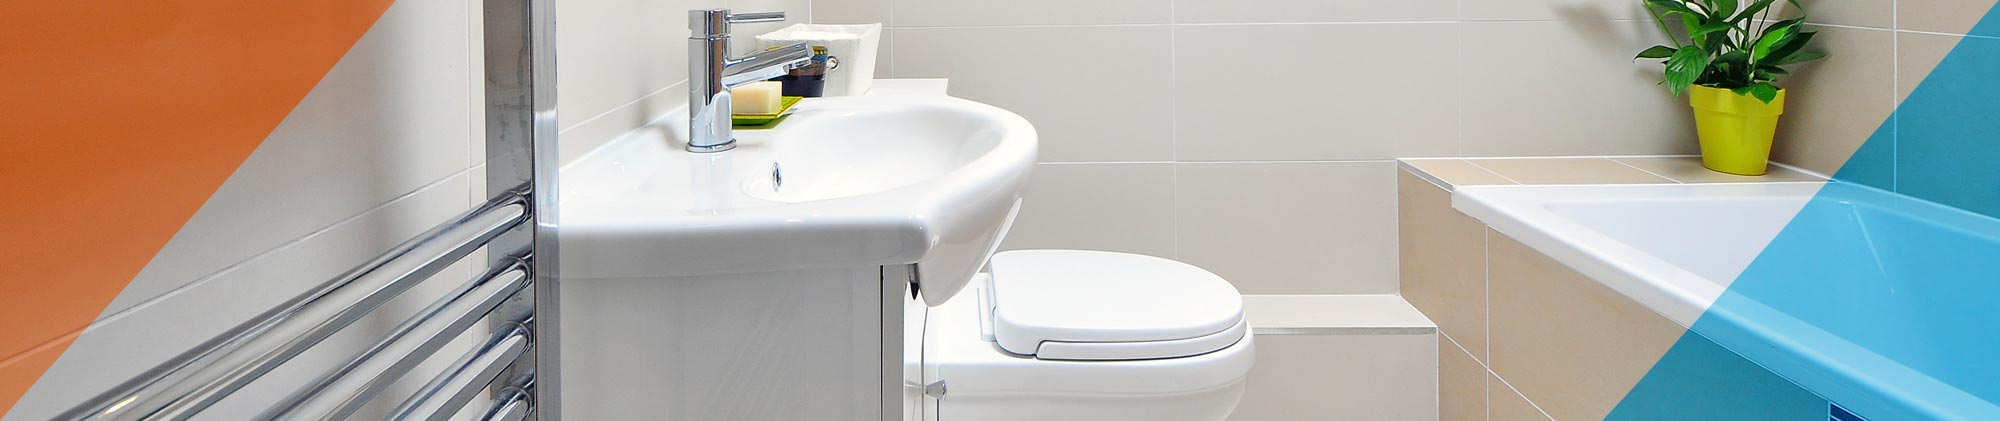 Idee Salle De Bain Recup ~ salle de bain quimper alamode furniture com